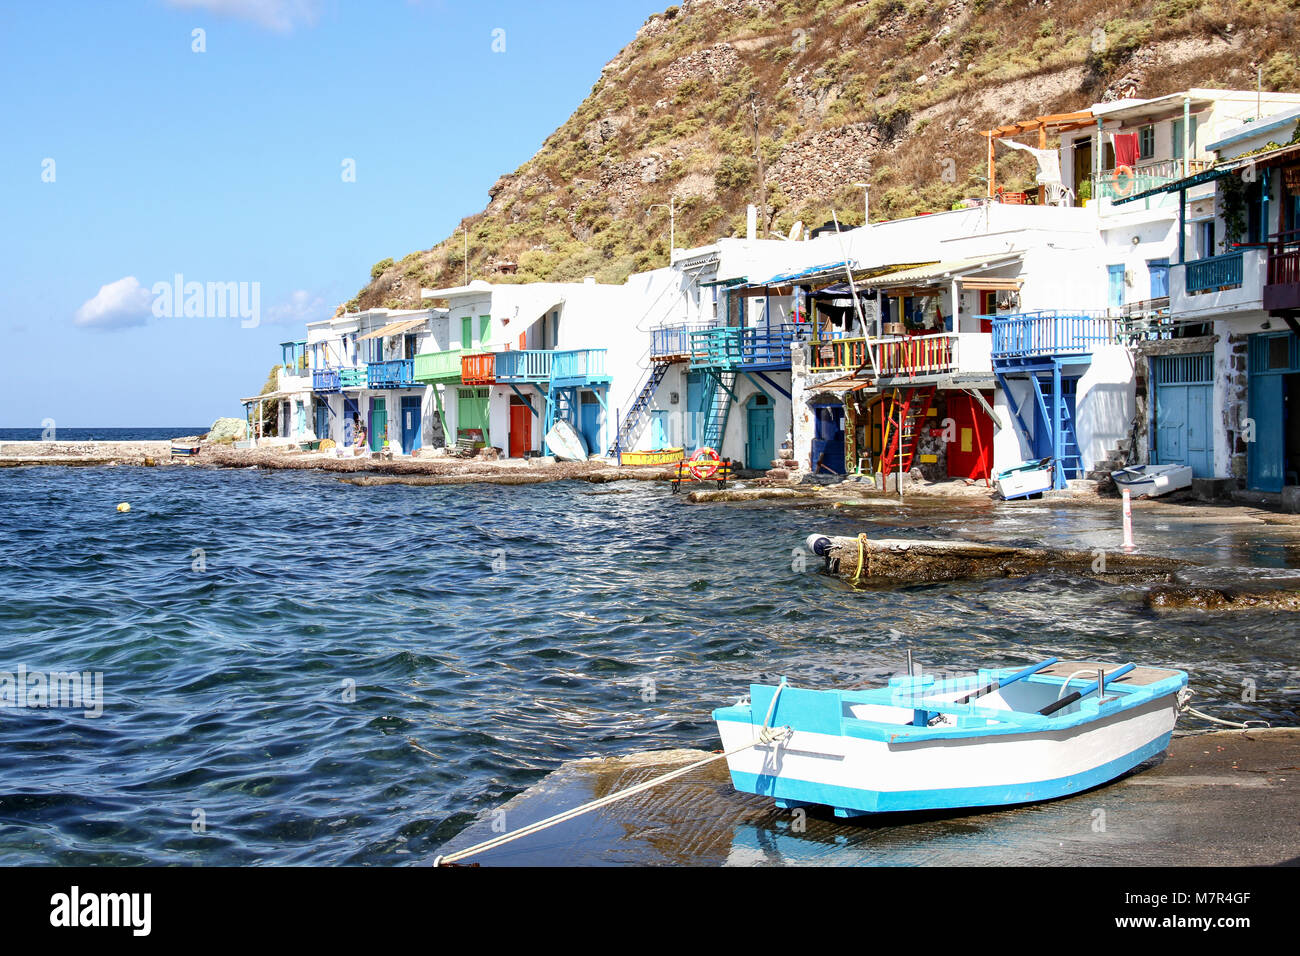 Beautiful and colorful village of Klima, Milos island, Cyclades islands, Greece - Stock Image